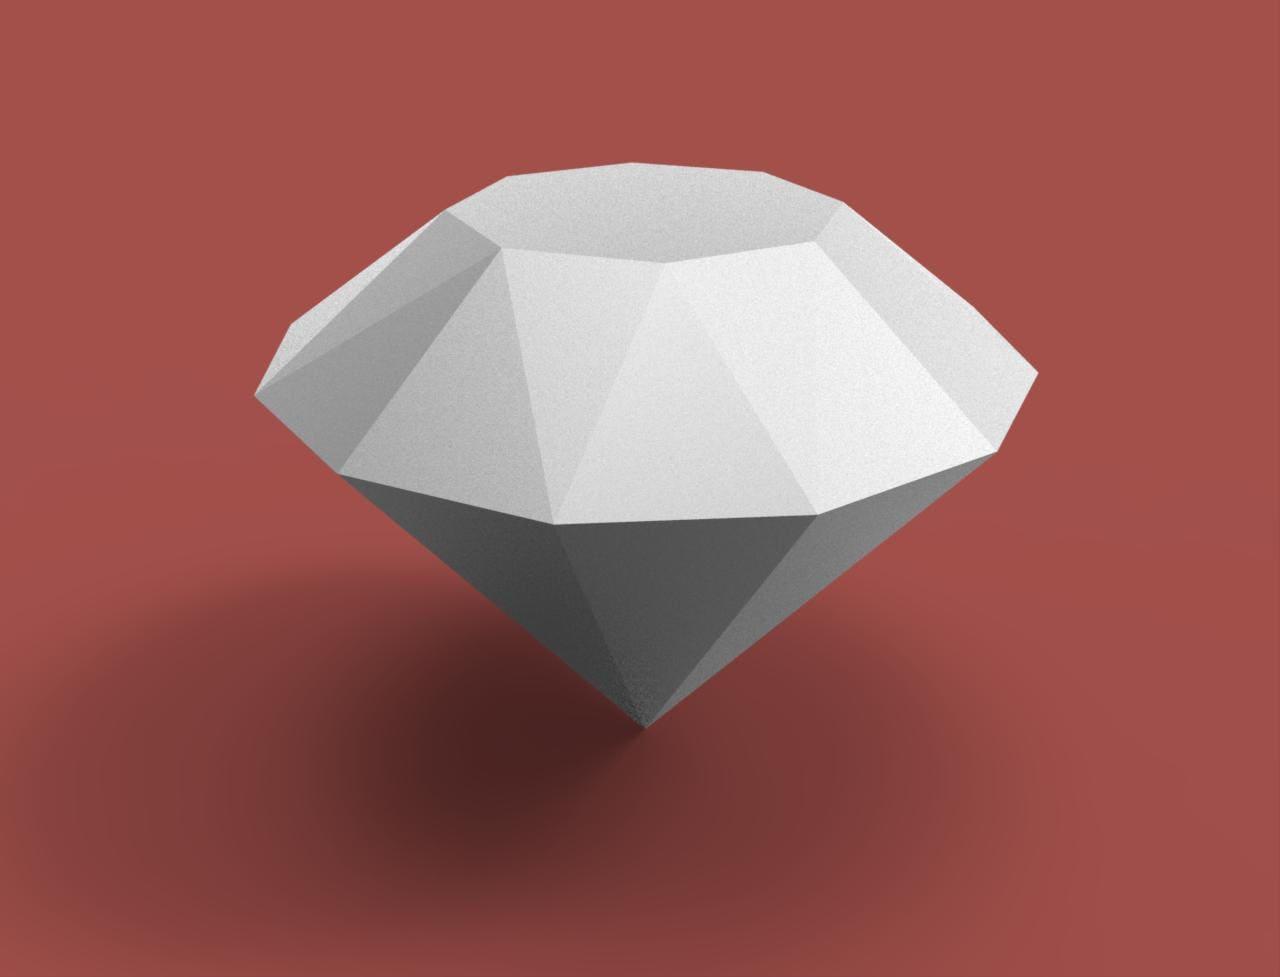 Diamond 3d Papercraft Model Download Pdf Template Diy